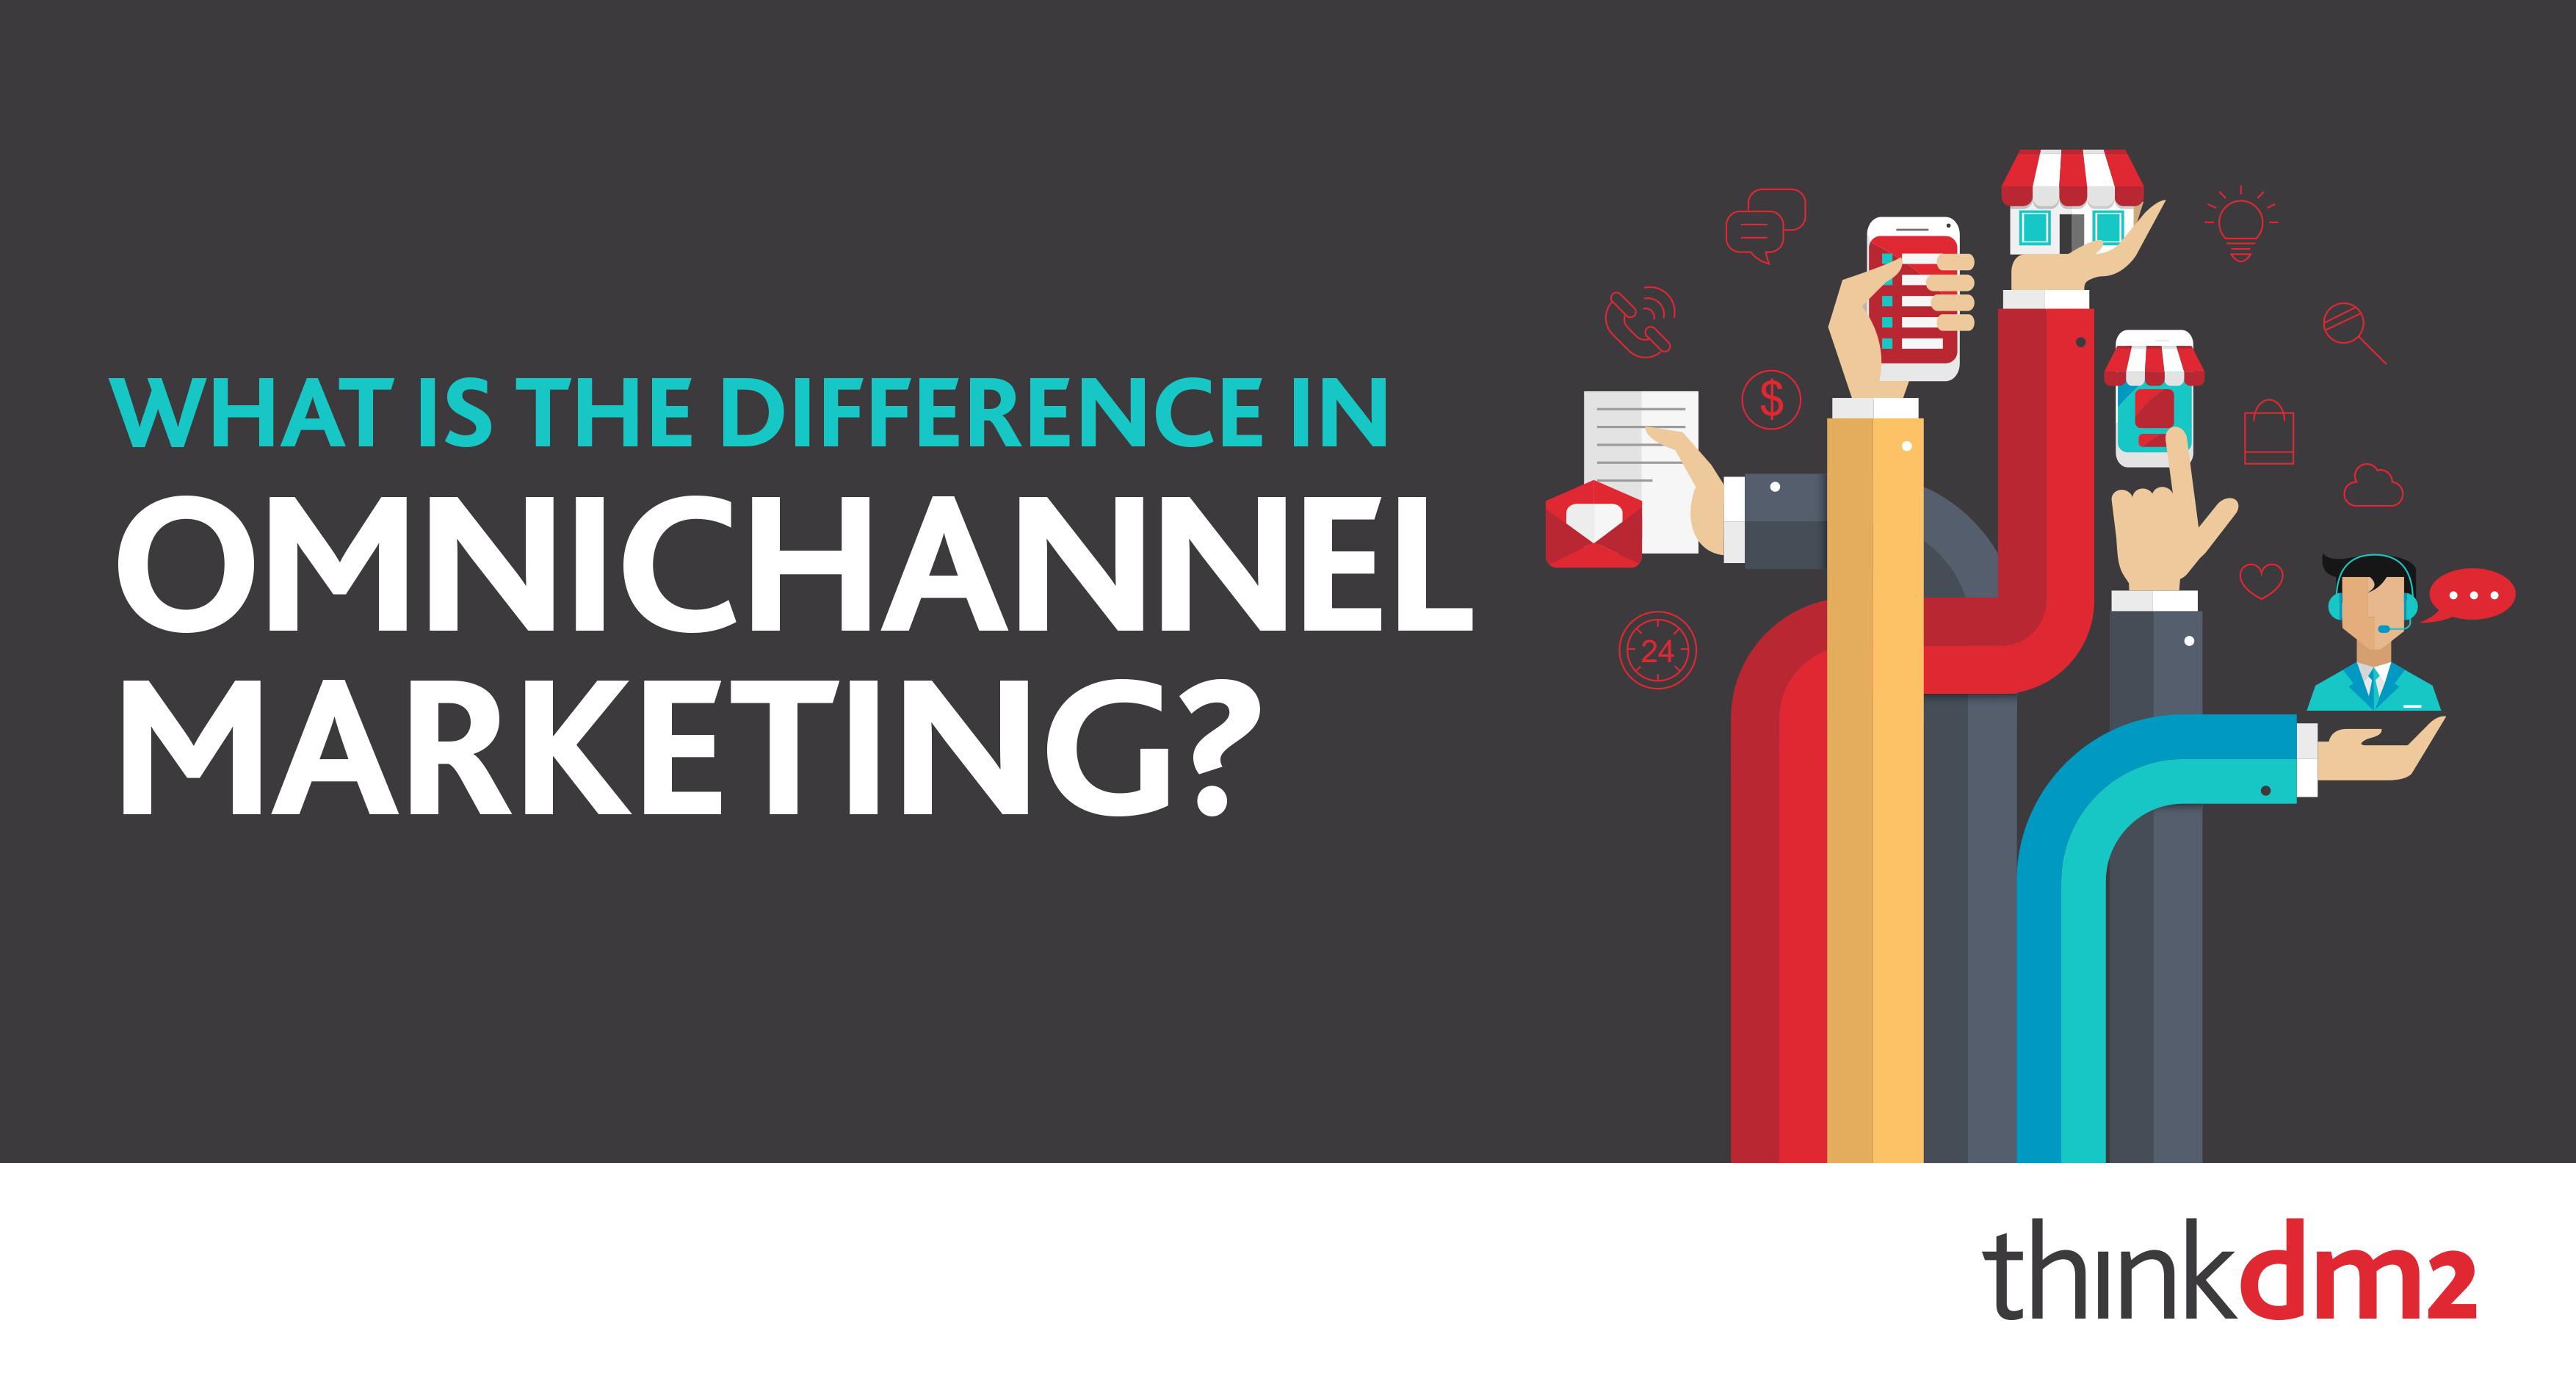 thinkdm2-what-is-omnichannel-marketing.png